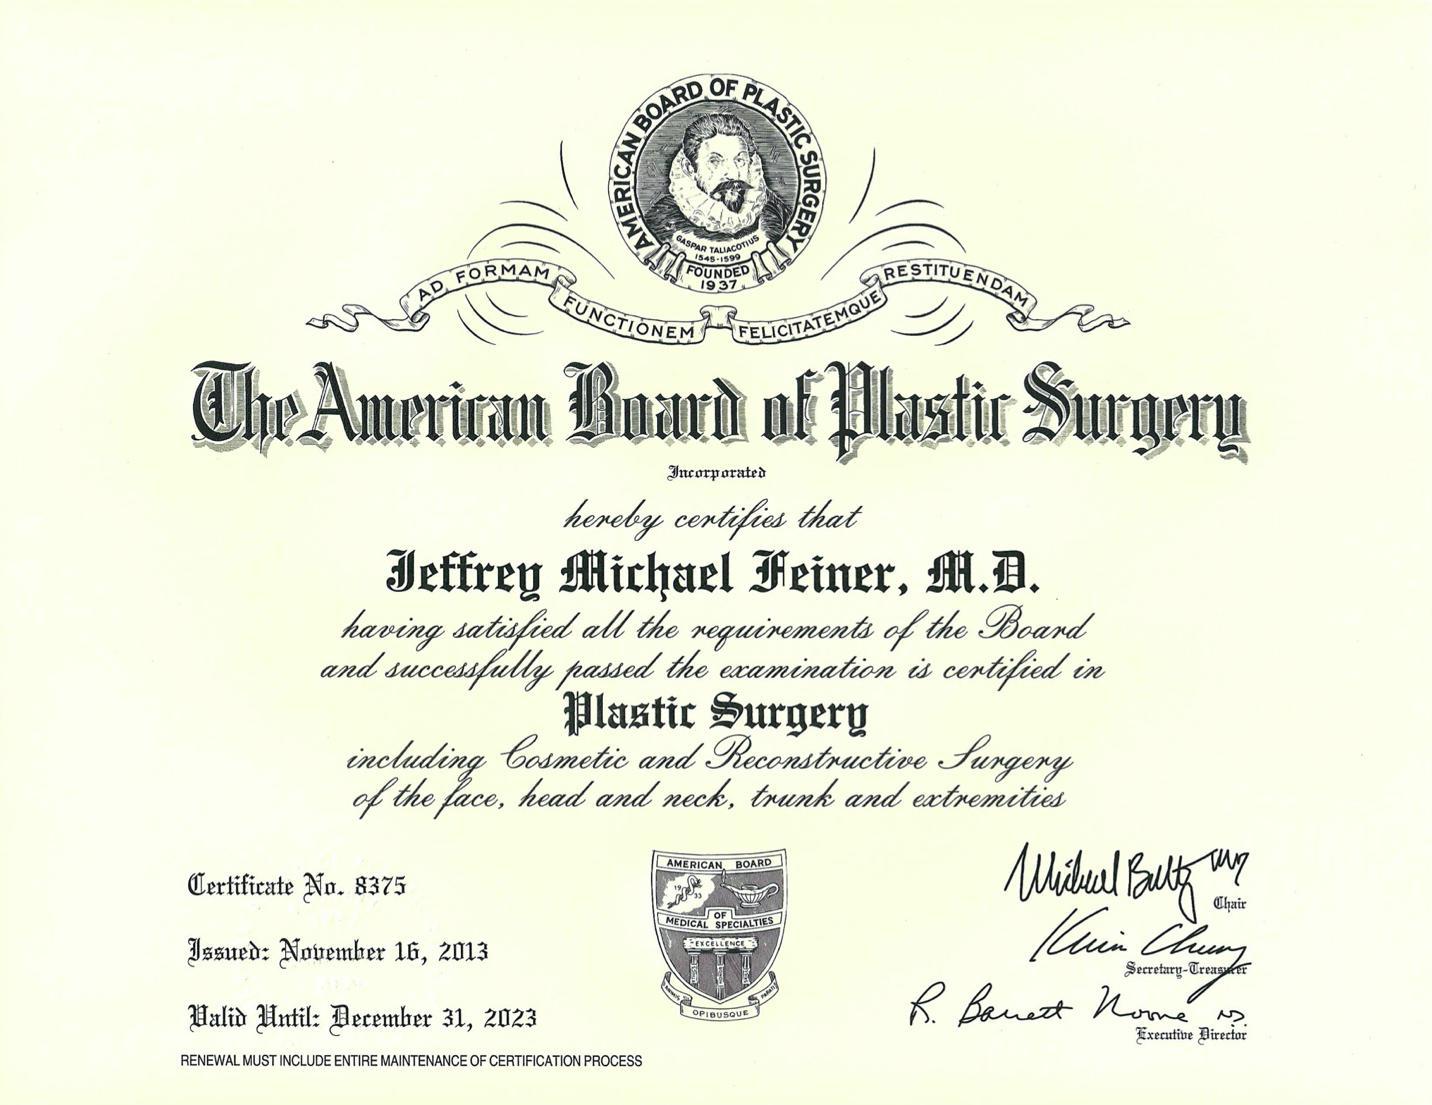 Board Certificate